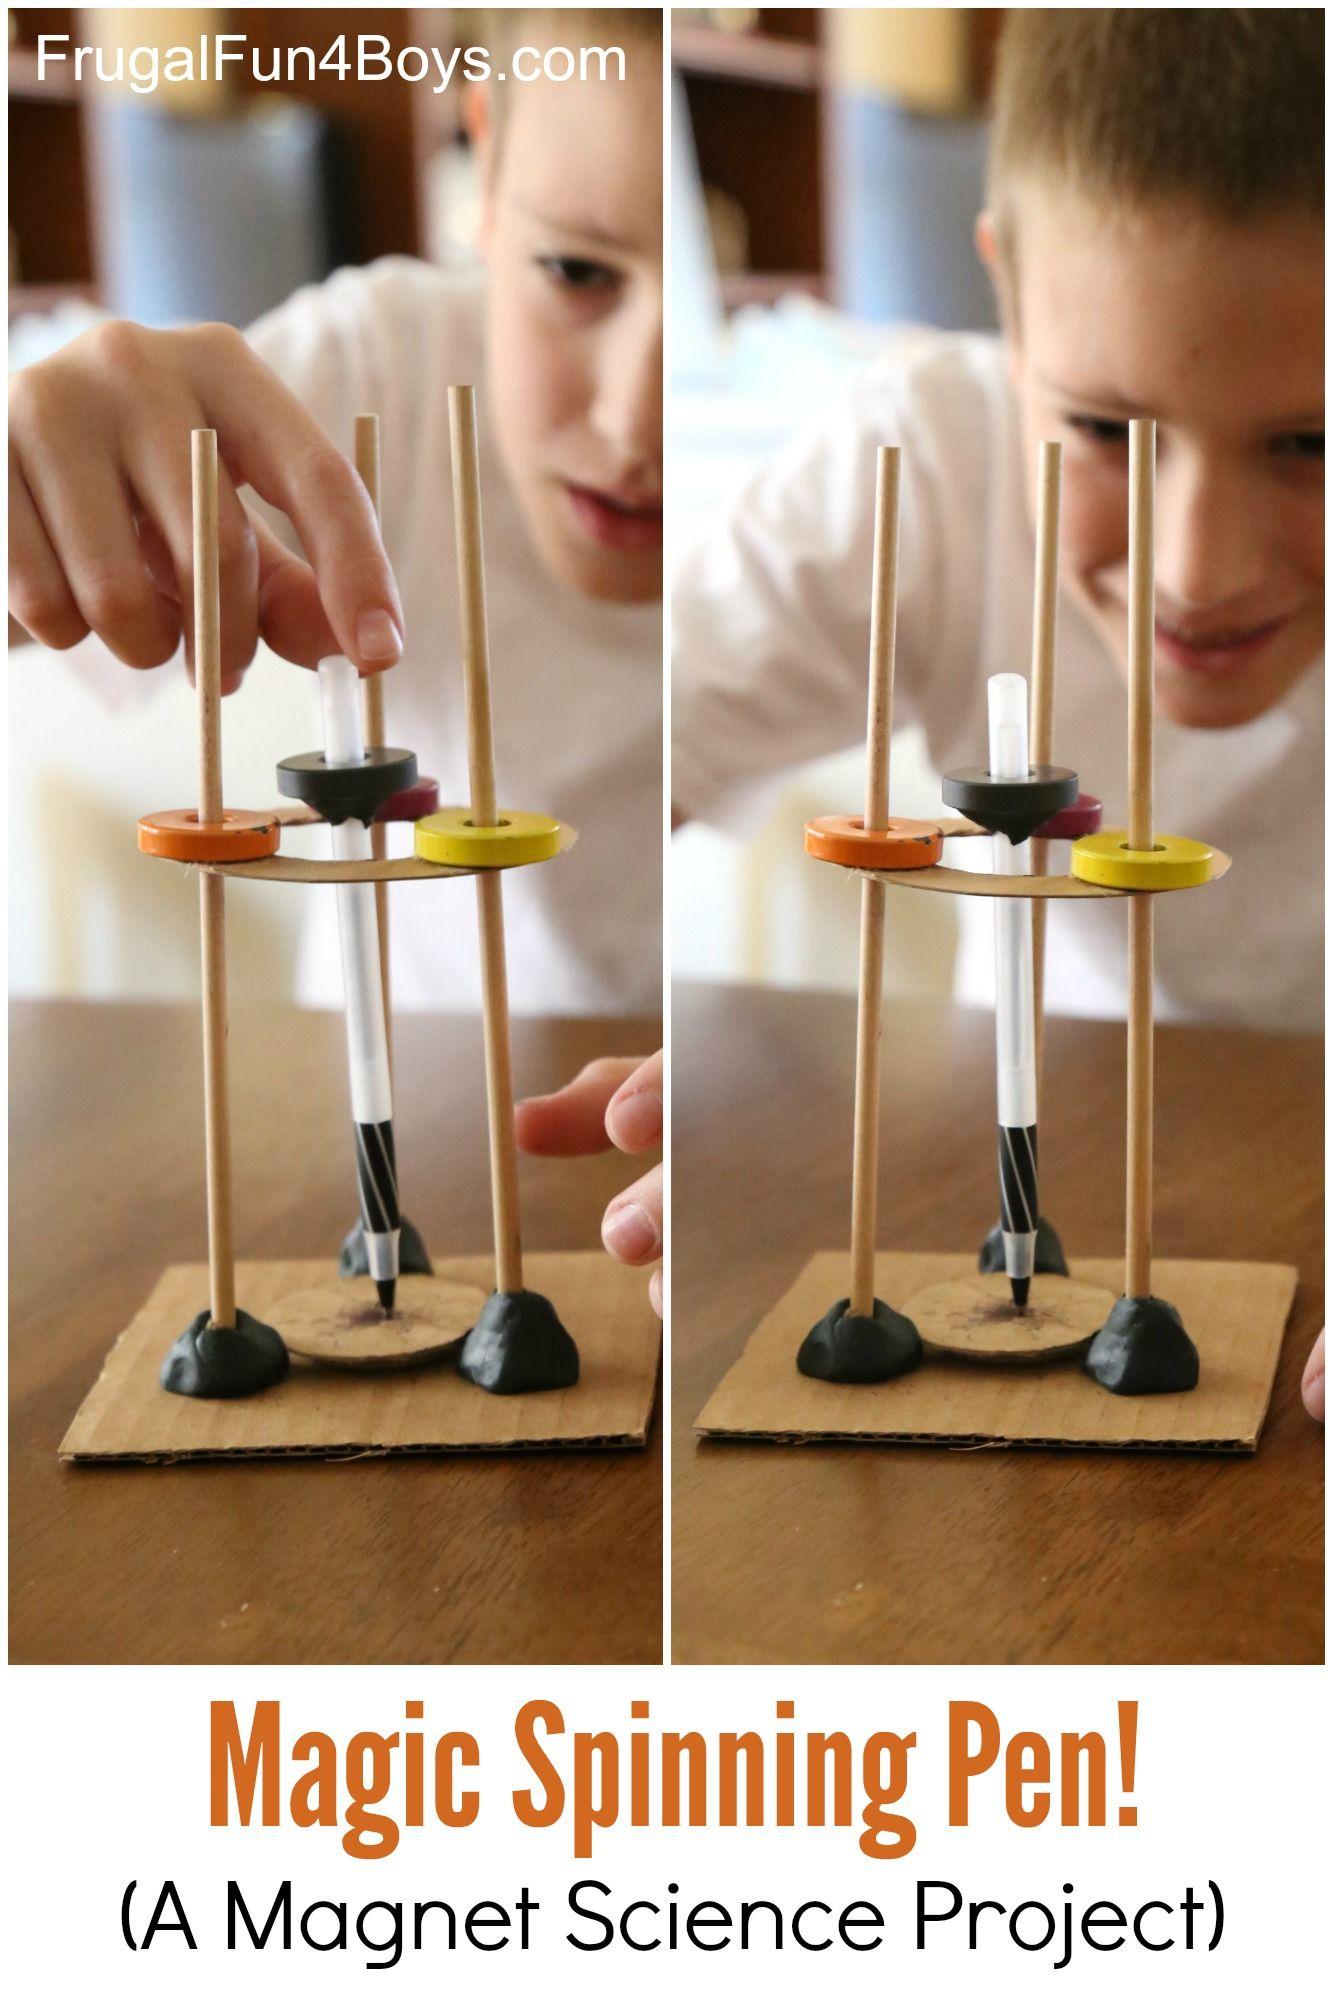 Magic Spinning Pen